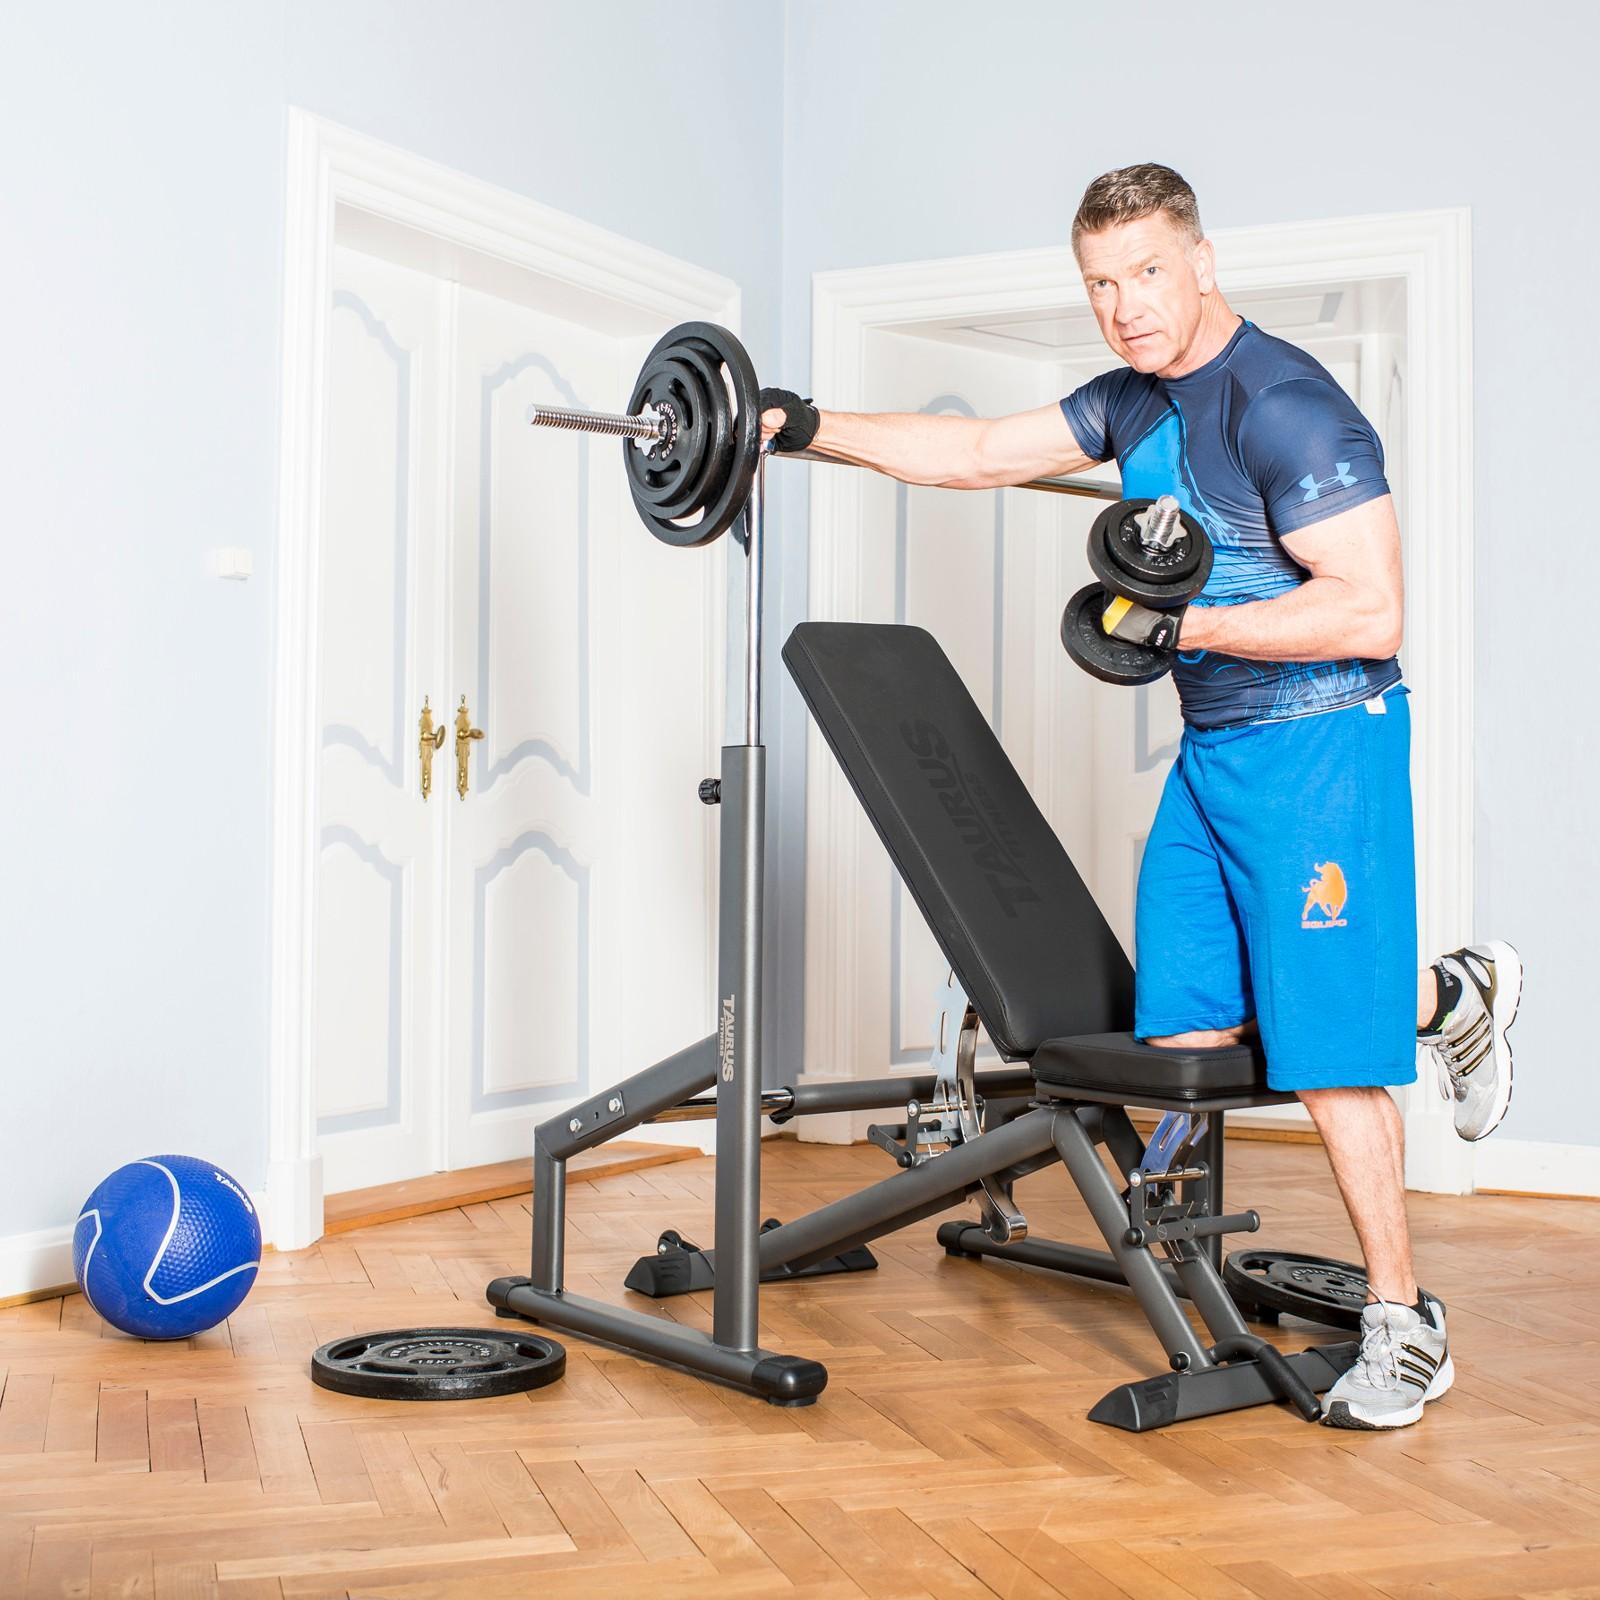 Taurus weight bench B900 buy with 198 customer ratings - Sport-Tiedje